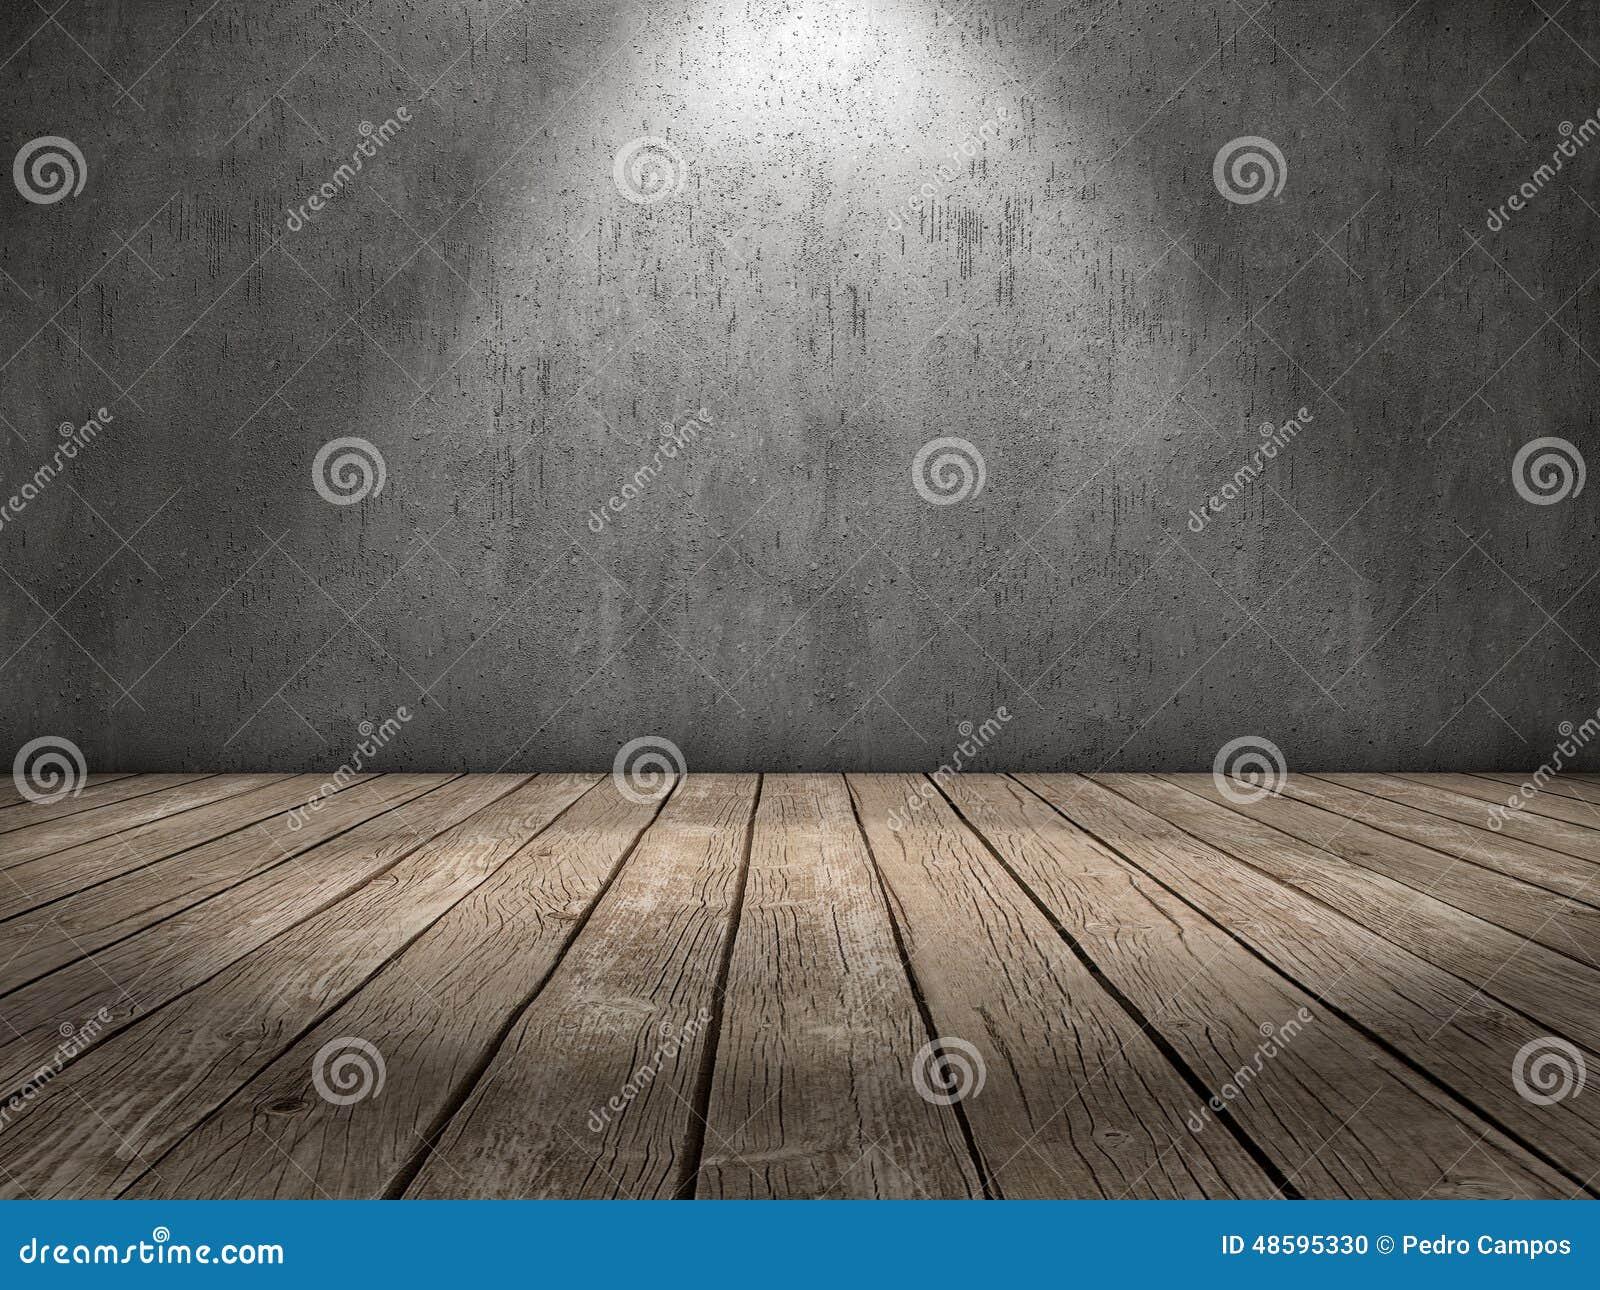 Spot light wood floor